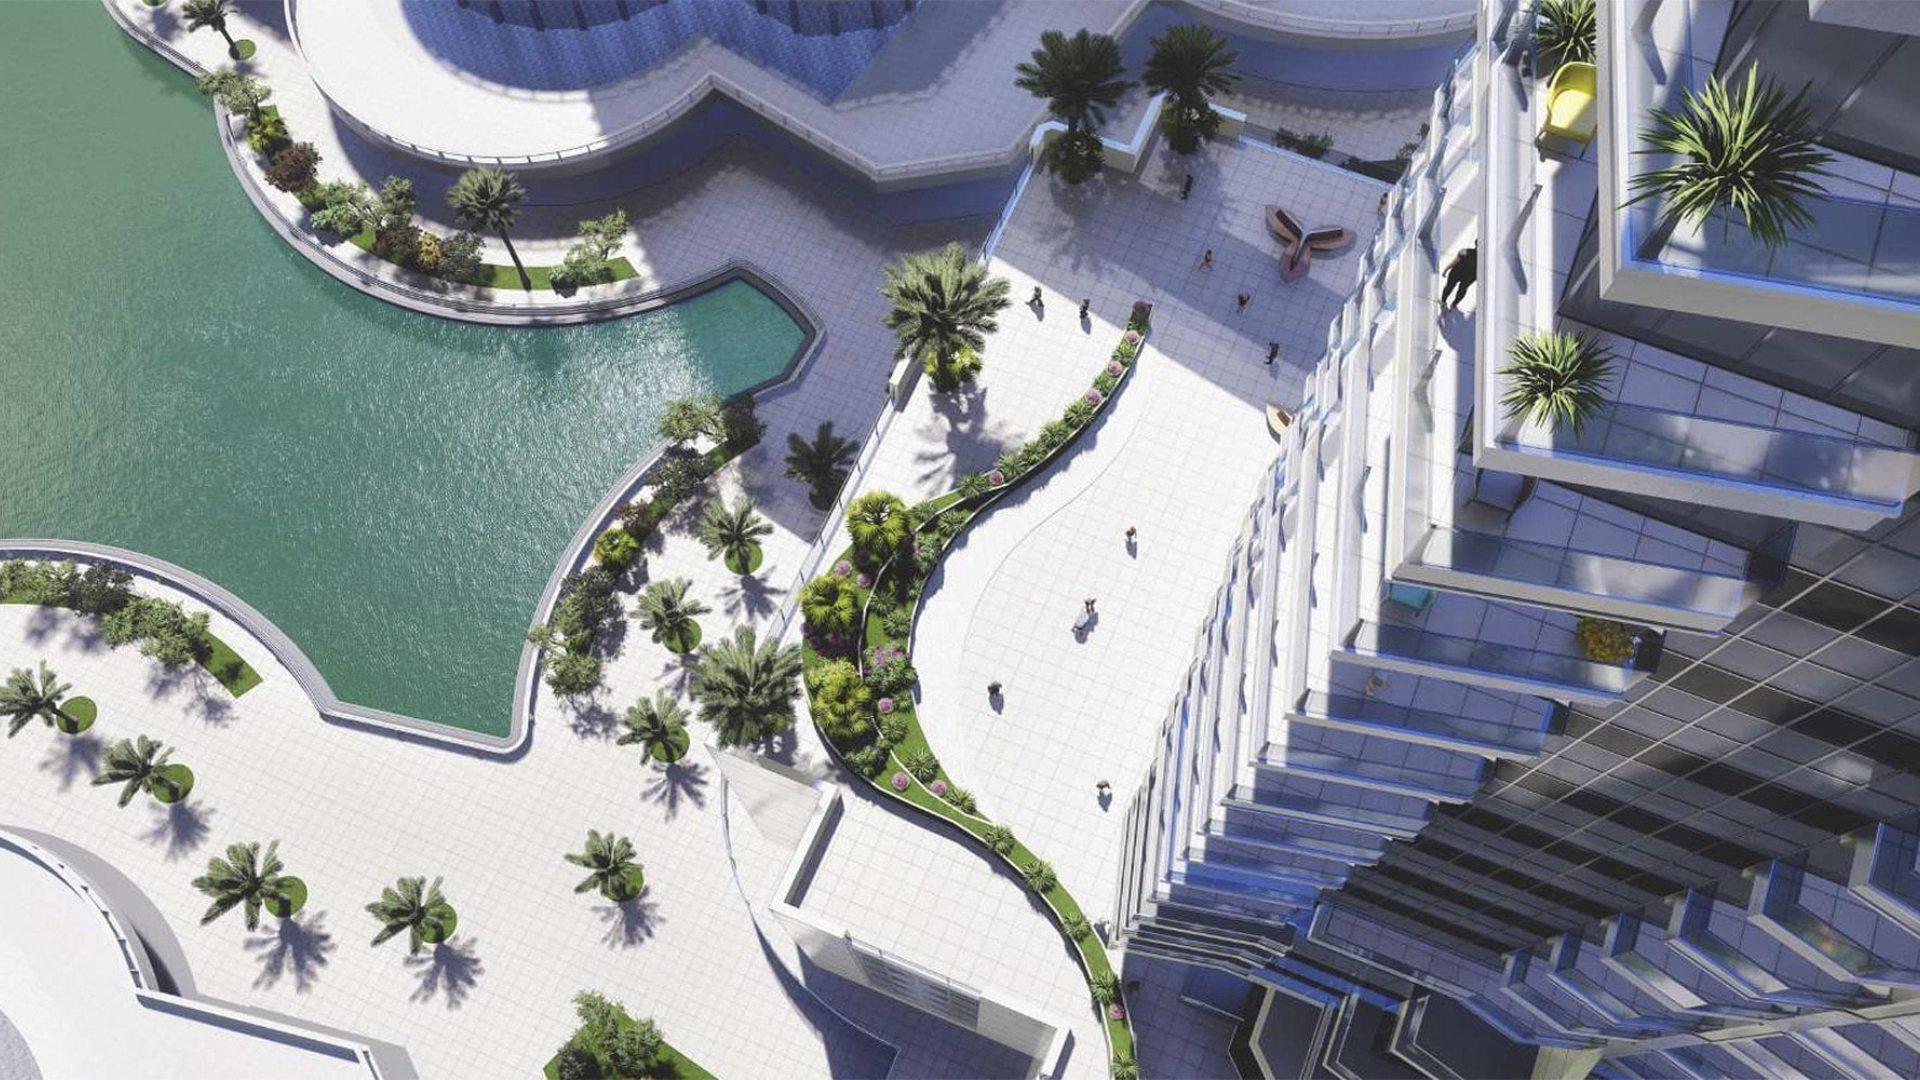 GOLF VIEWS SEVEN CITY, Jumeirah Lake Towers, Dubai, UAE – photo 3